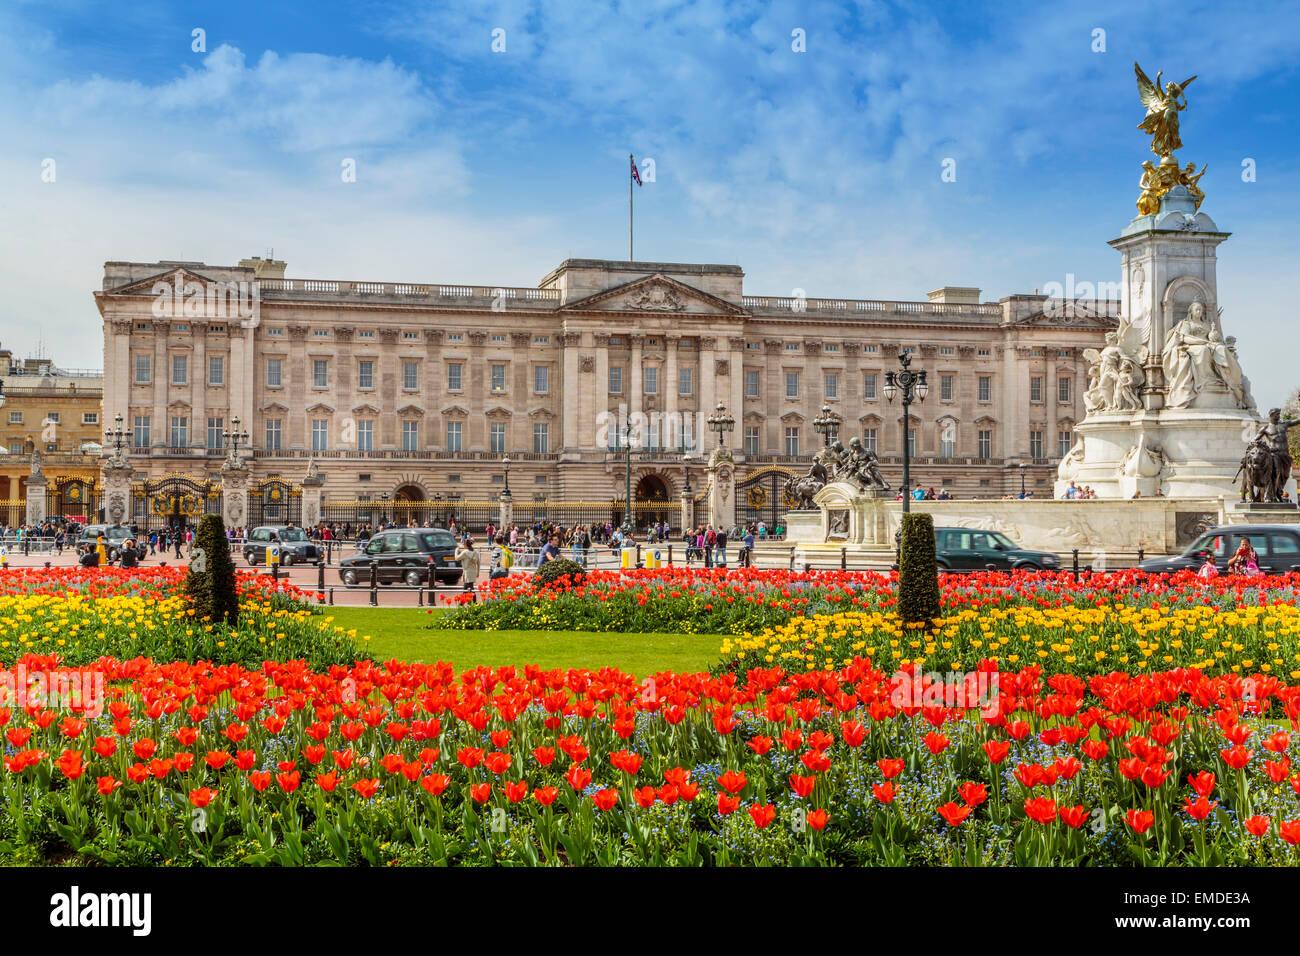 Eine Landschaft Blick auf den Buckingham Palace im Frühling, Westminster, London, England, Großbritannien Stockbild